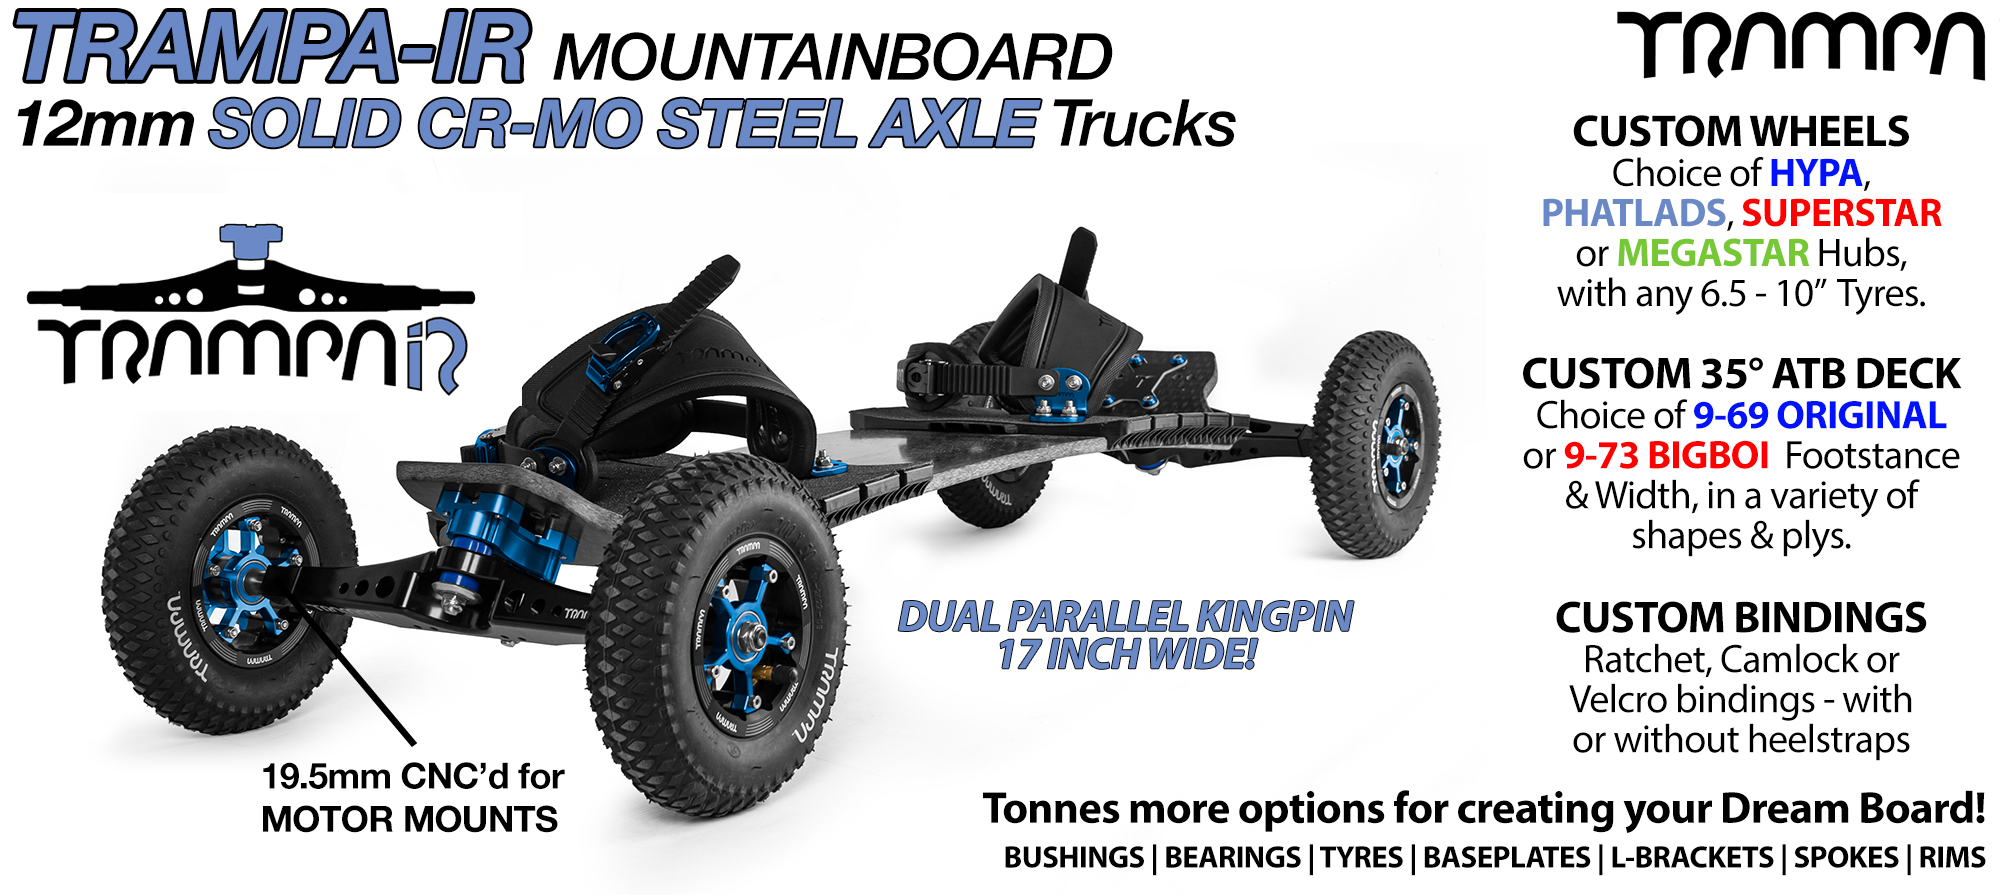 TRAMPA-IR Mountainboard with 12mm SOLID Axle 17 inch wide IR Trucks,RATCHET Bindings & Custom Wheels